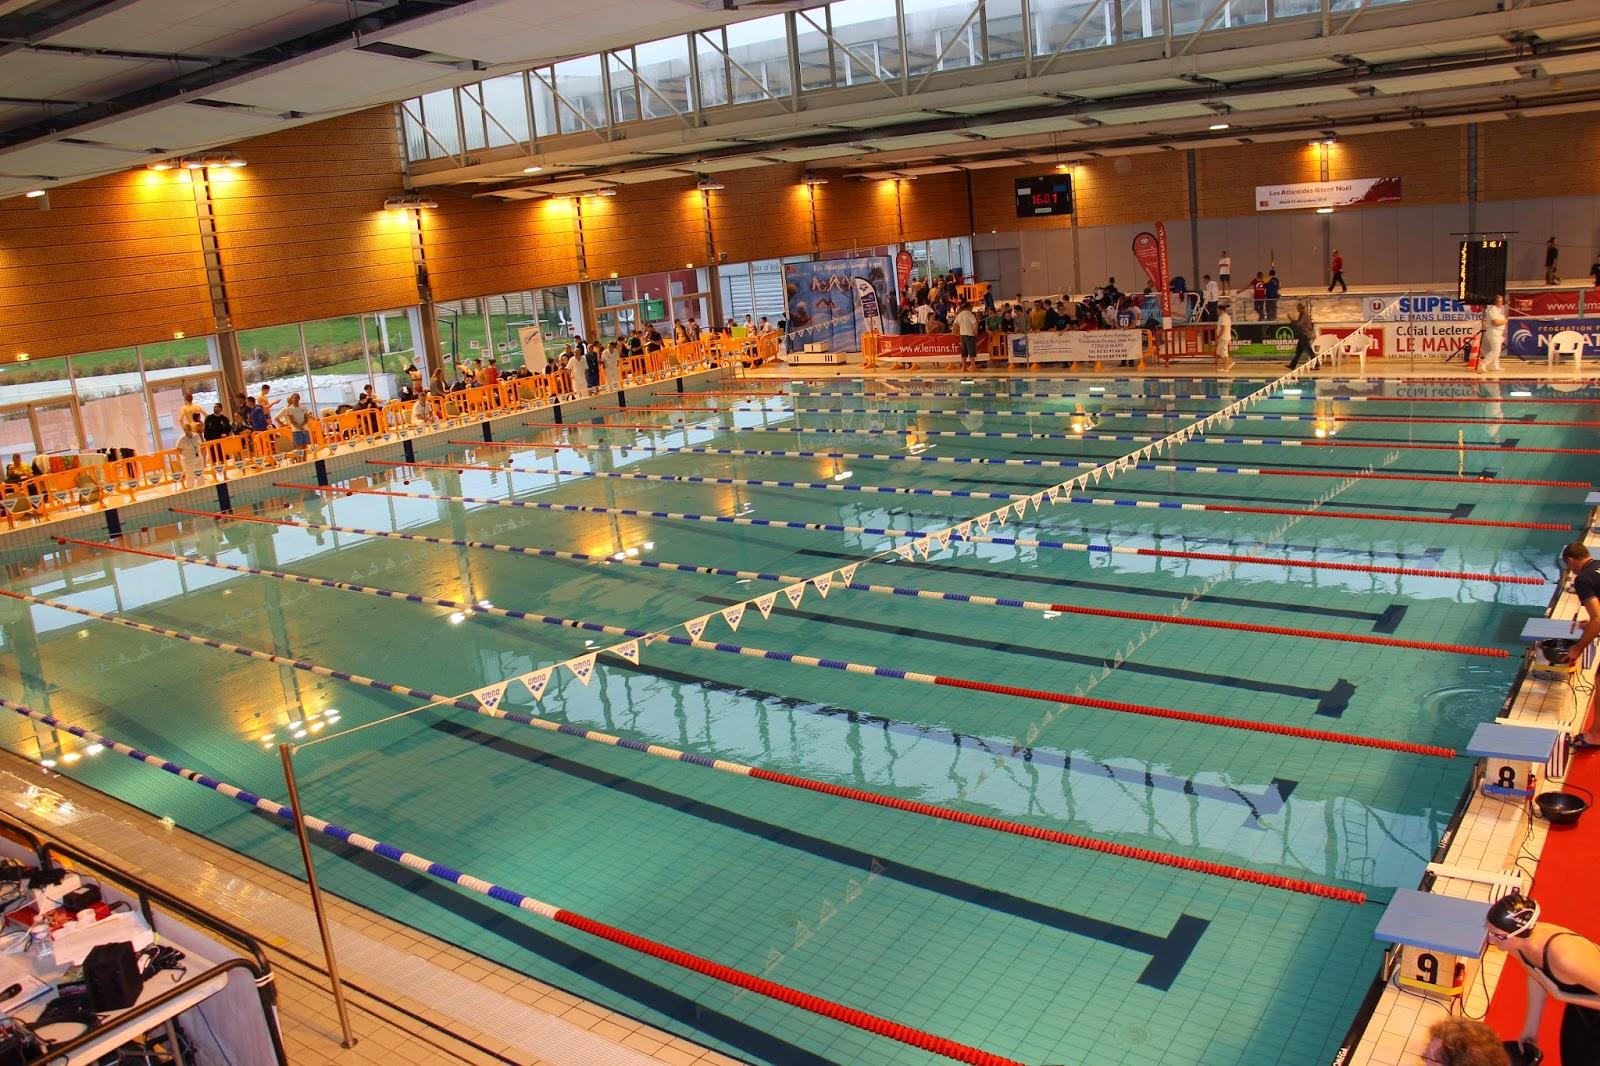 Les derni res nouvelles ecn club de natation ecn - Piscine semi creusee le mans ...